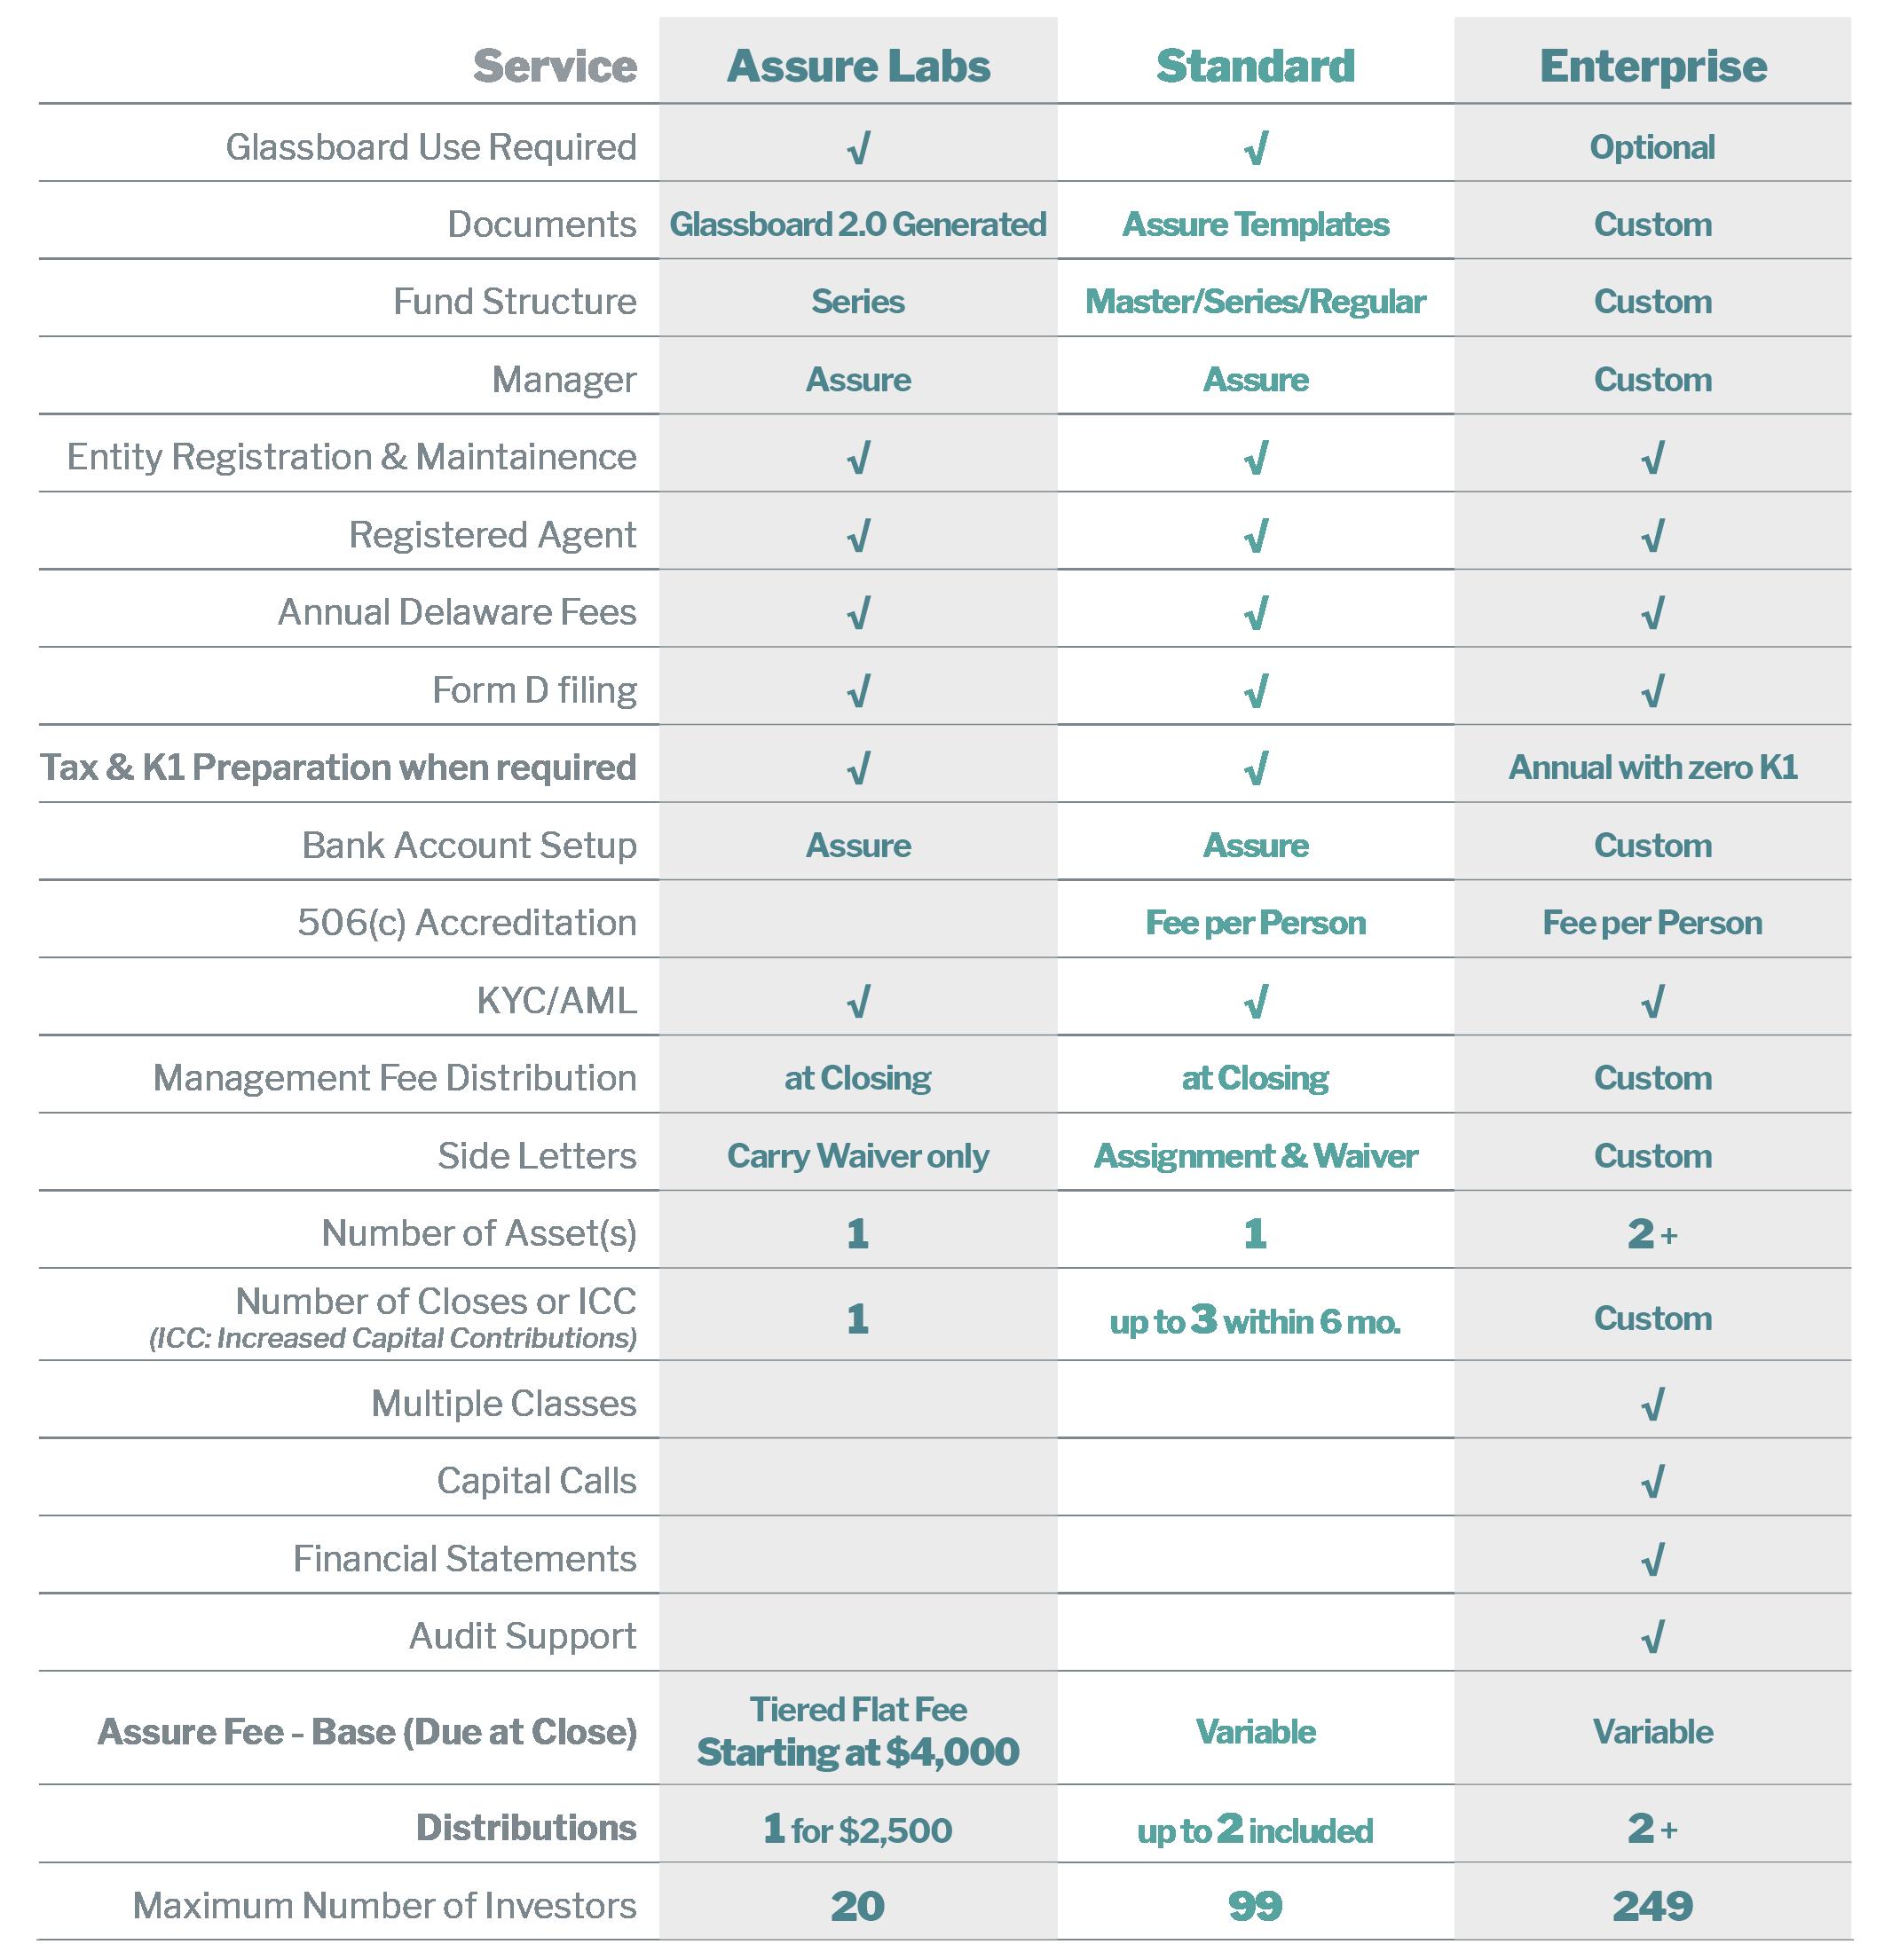 Assure SPV Product Tiers